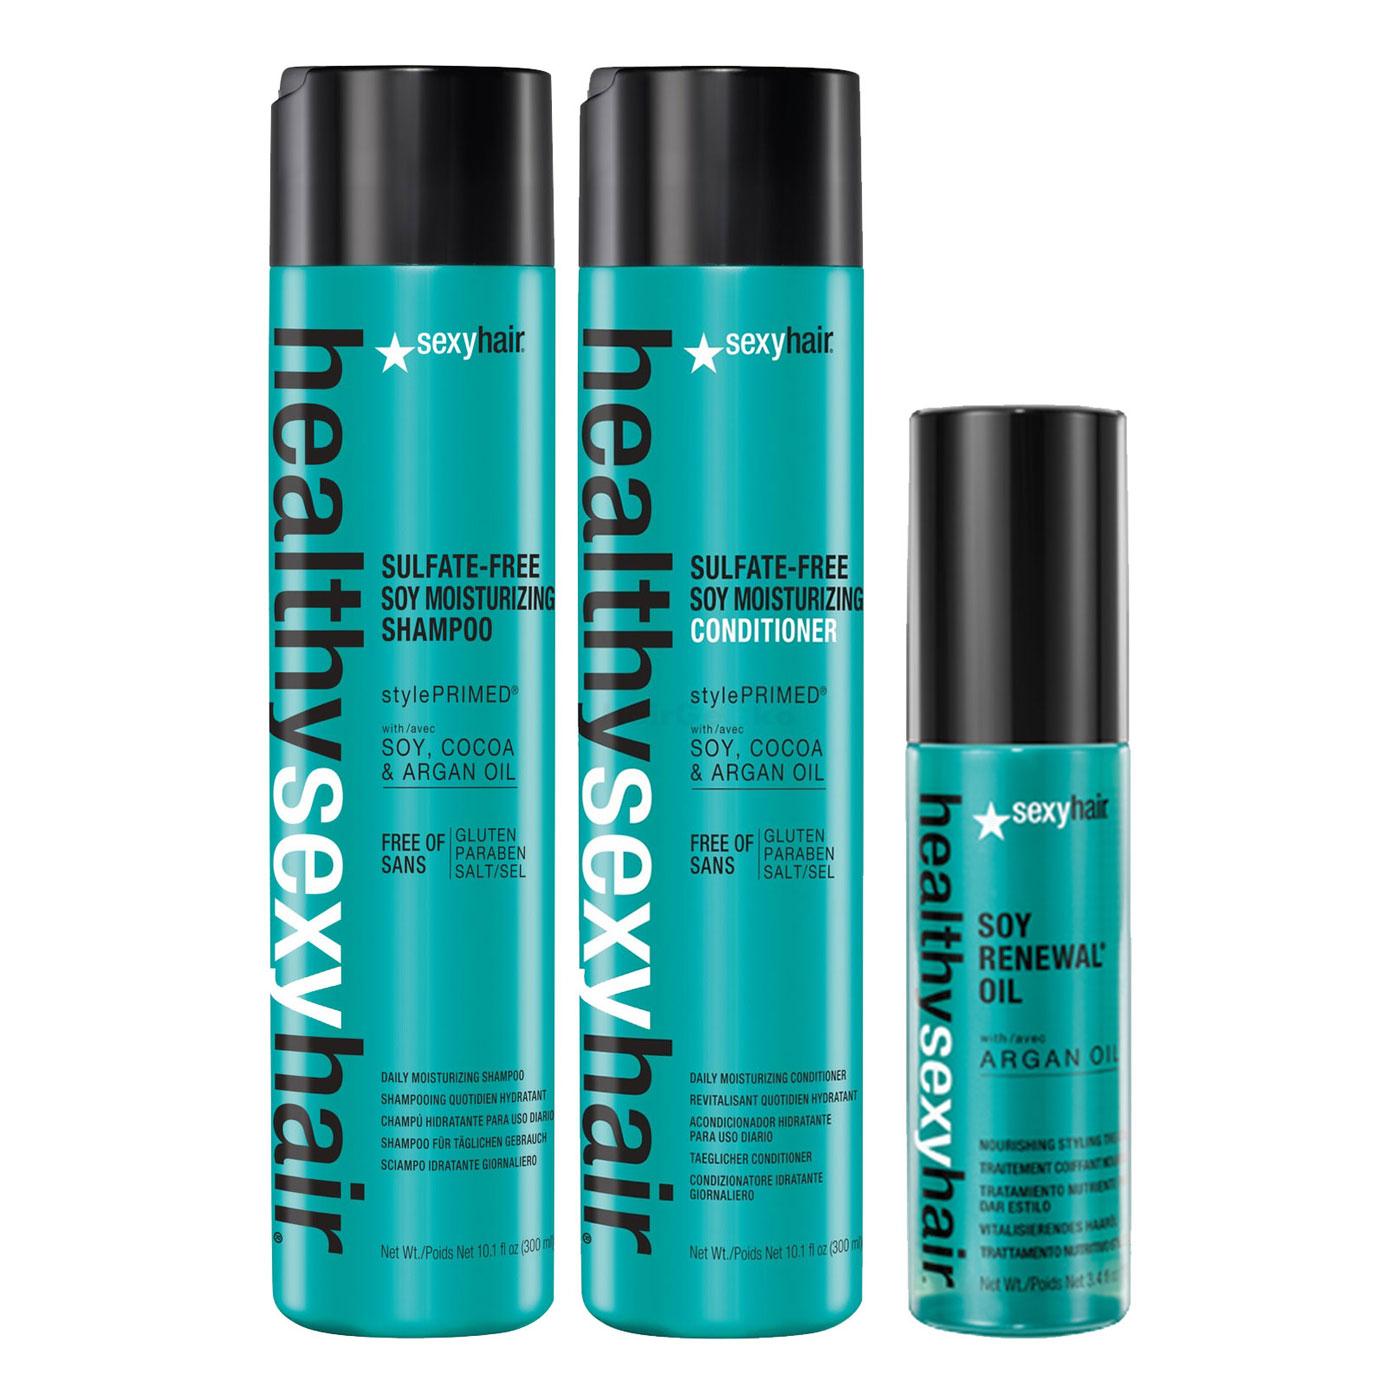 Sexy Hair Healthy Set - Soy Moisturizing Shampoo 300ml + Soy Moisturizing Conditioner 300ml + Soy Renewal Oil 100ml